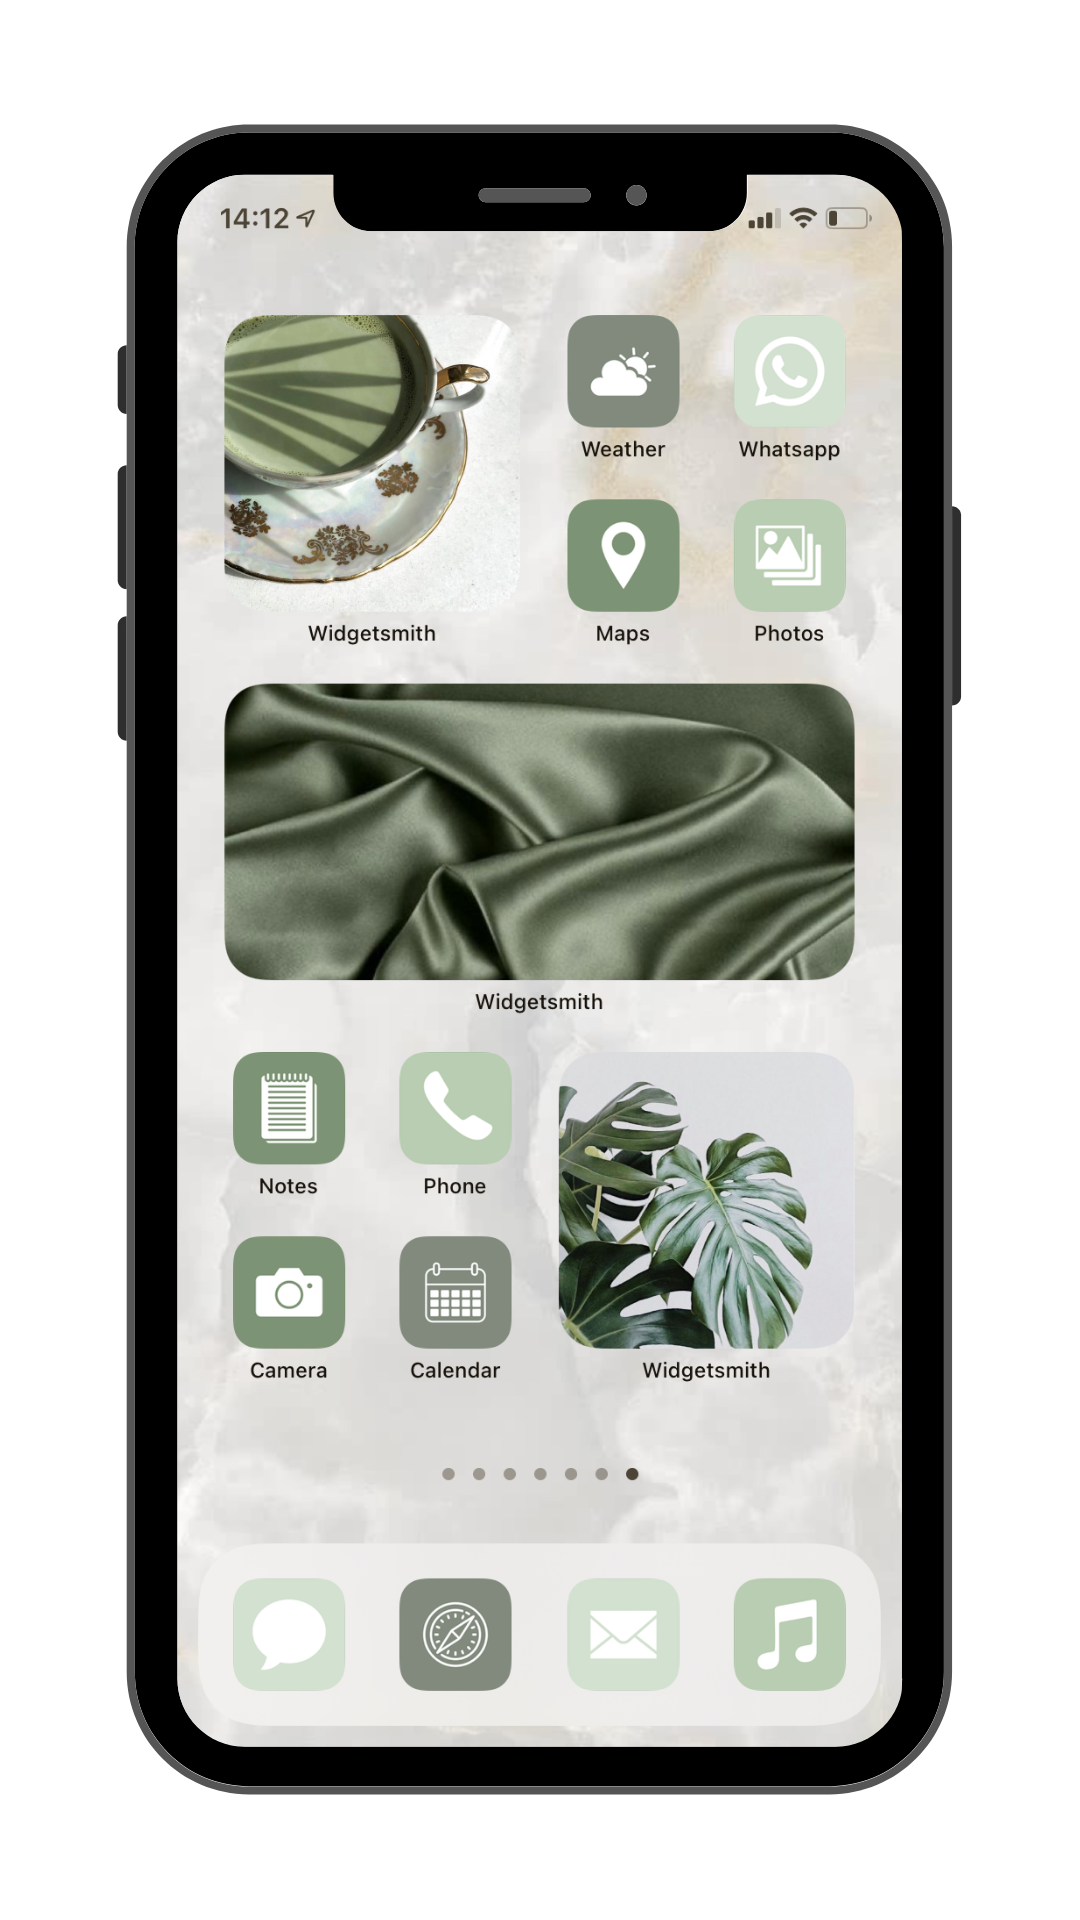 Green Matcha Aesthetic-green home screen aesthetic-matcha green aesthetic-matcha icons-matcha green